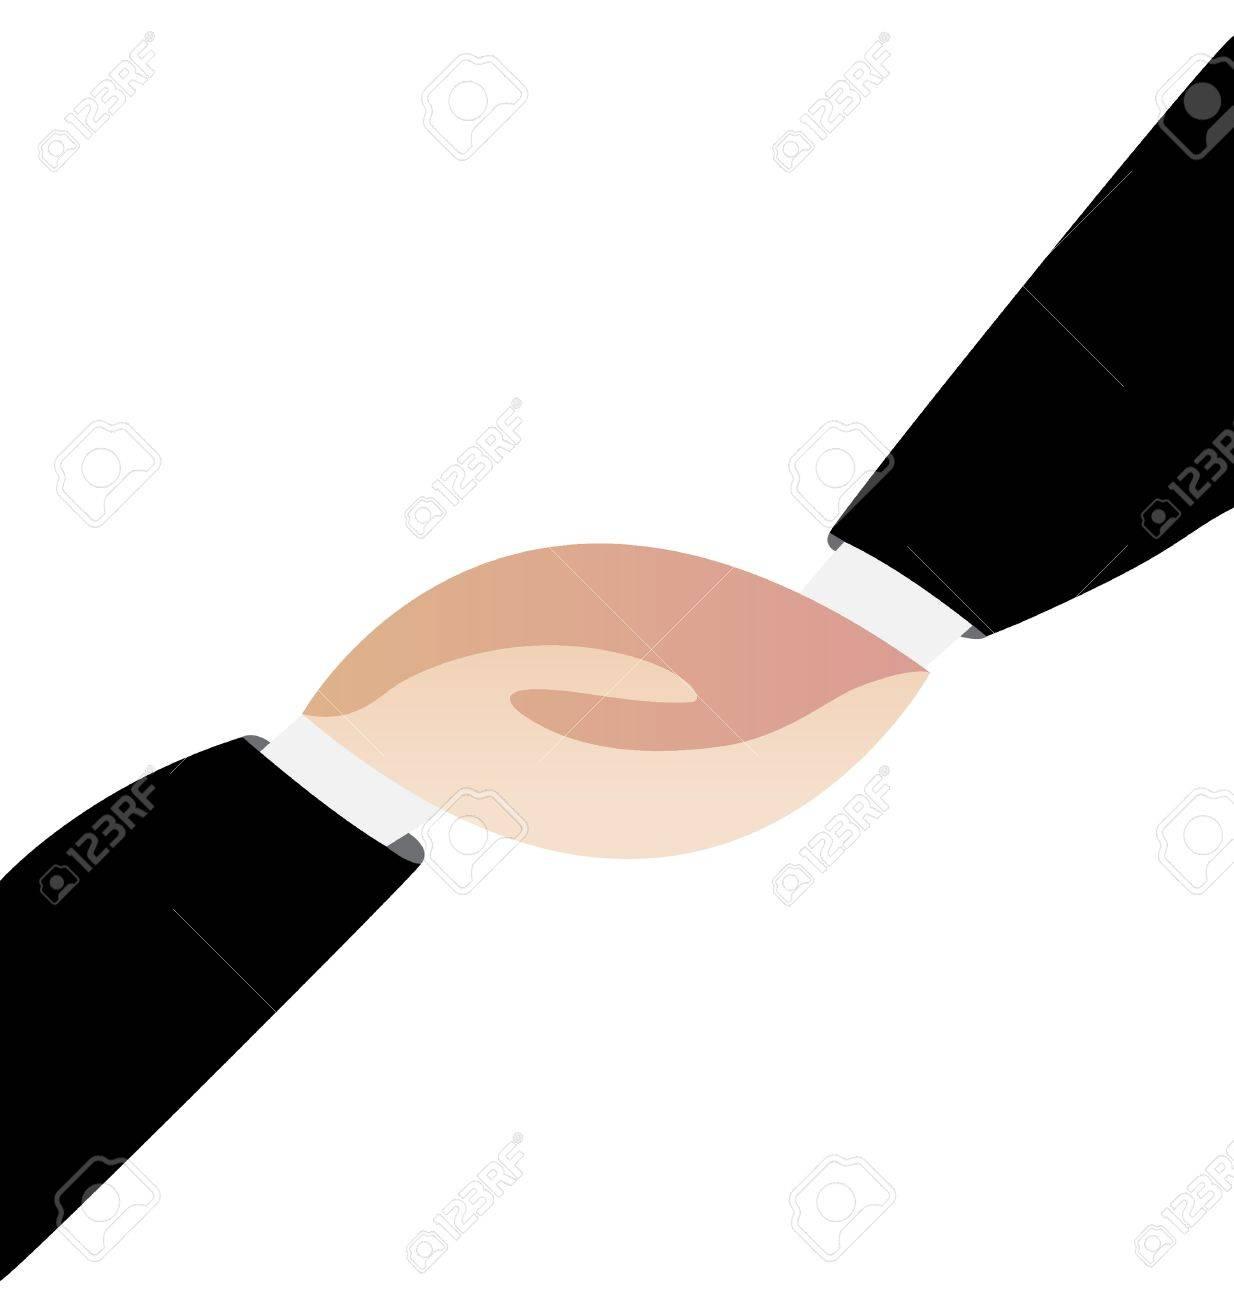 Friendly hands logo - 17425439